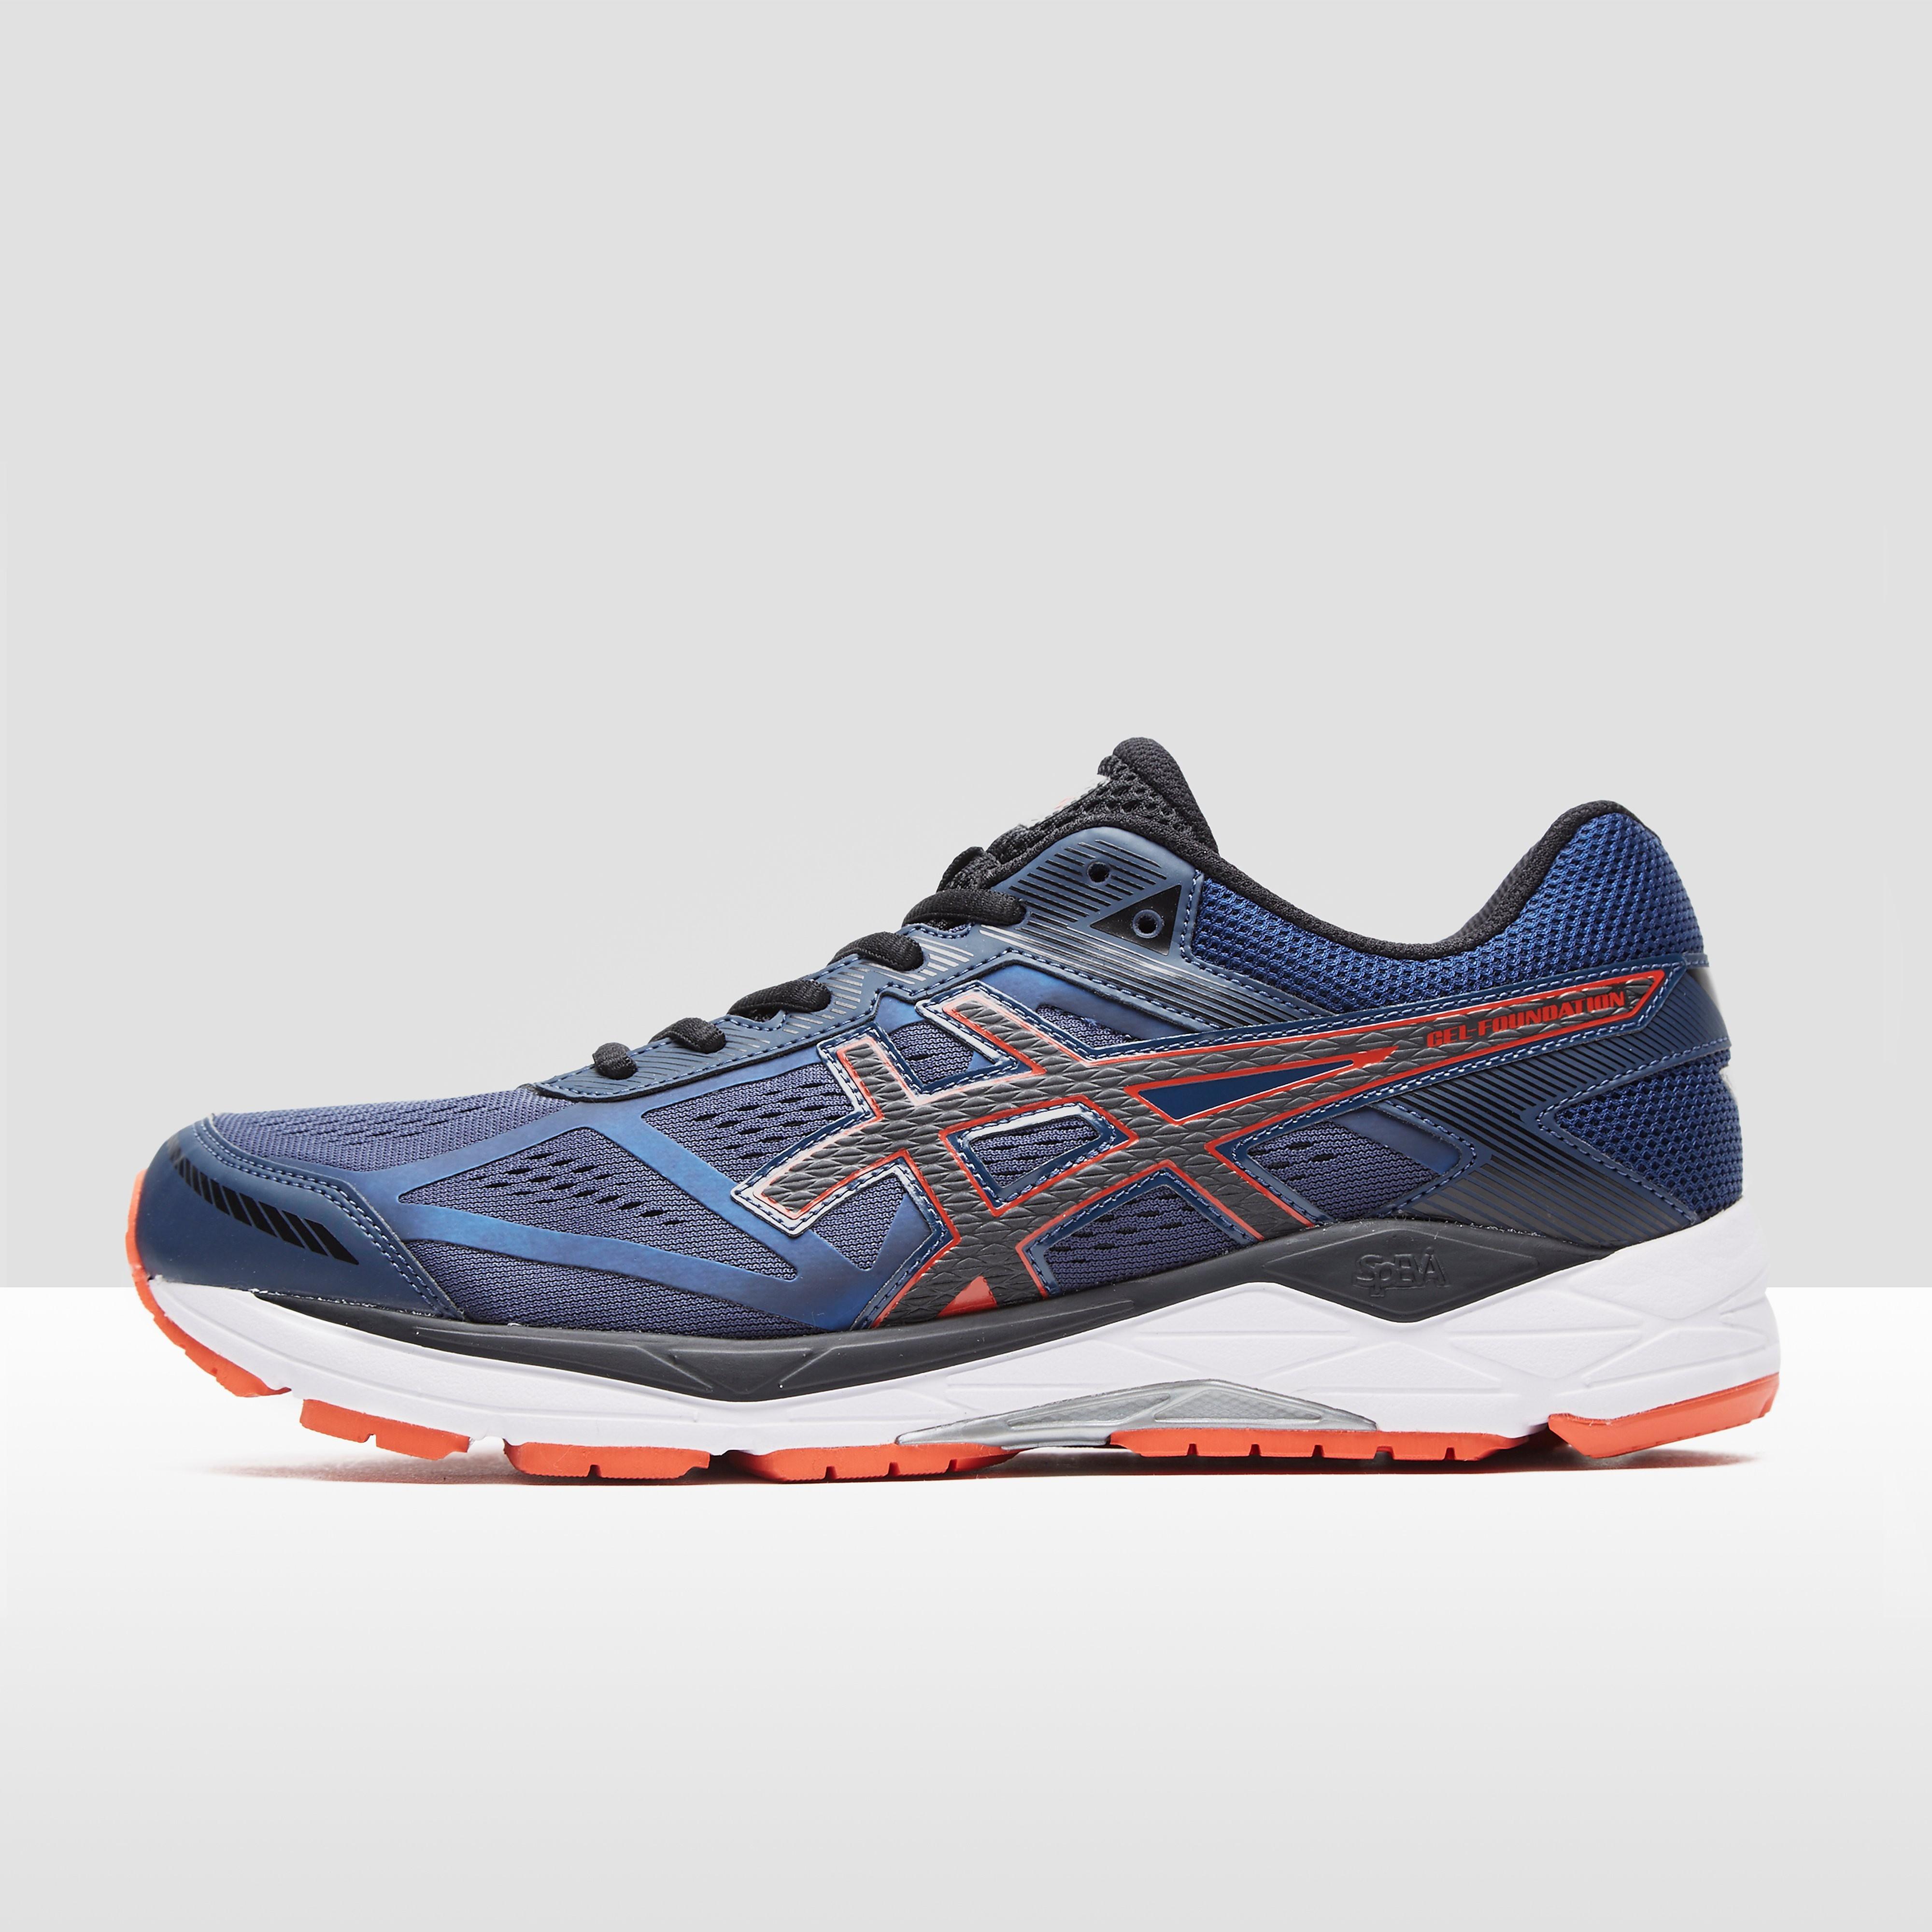 Asics Gel-Foundation Men's Running Shoes